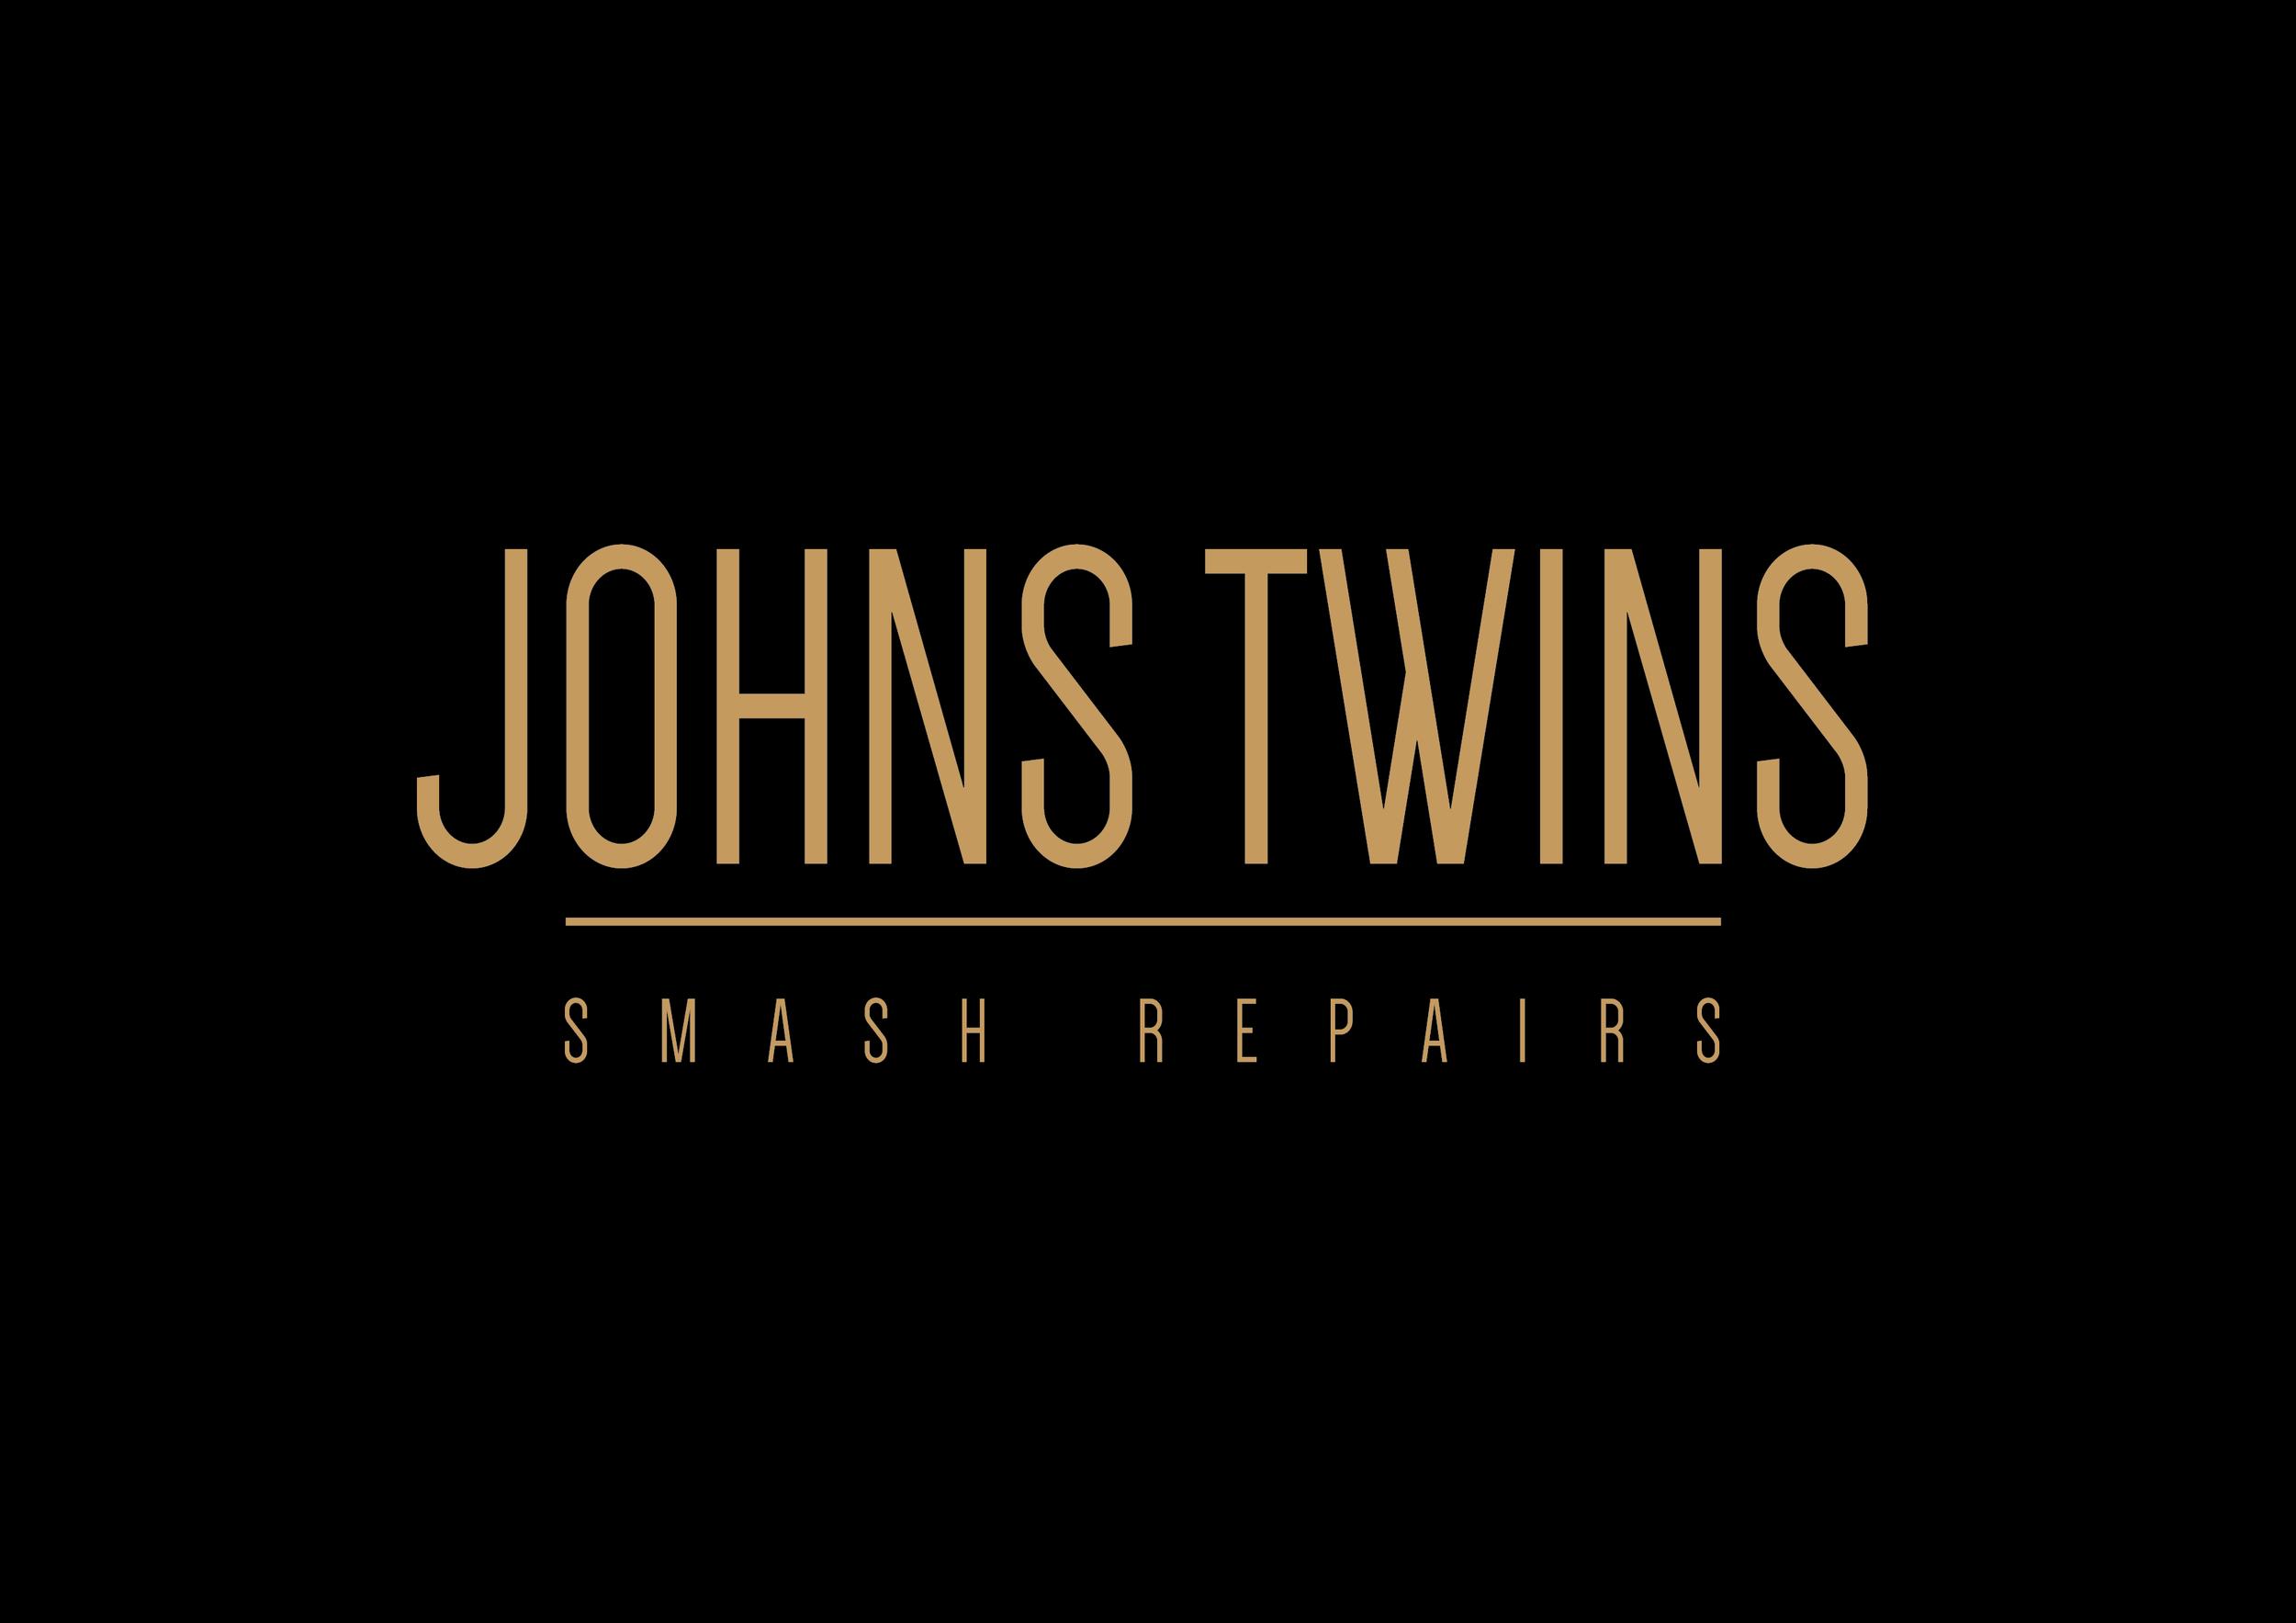 JohnsTwins_CMYK.png